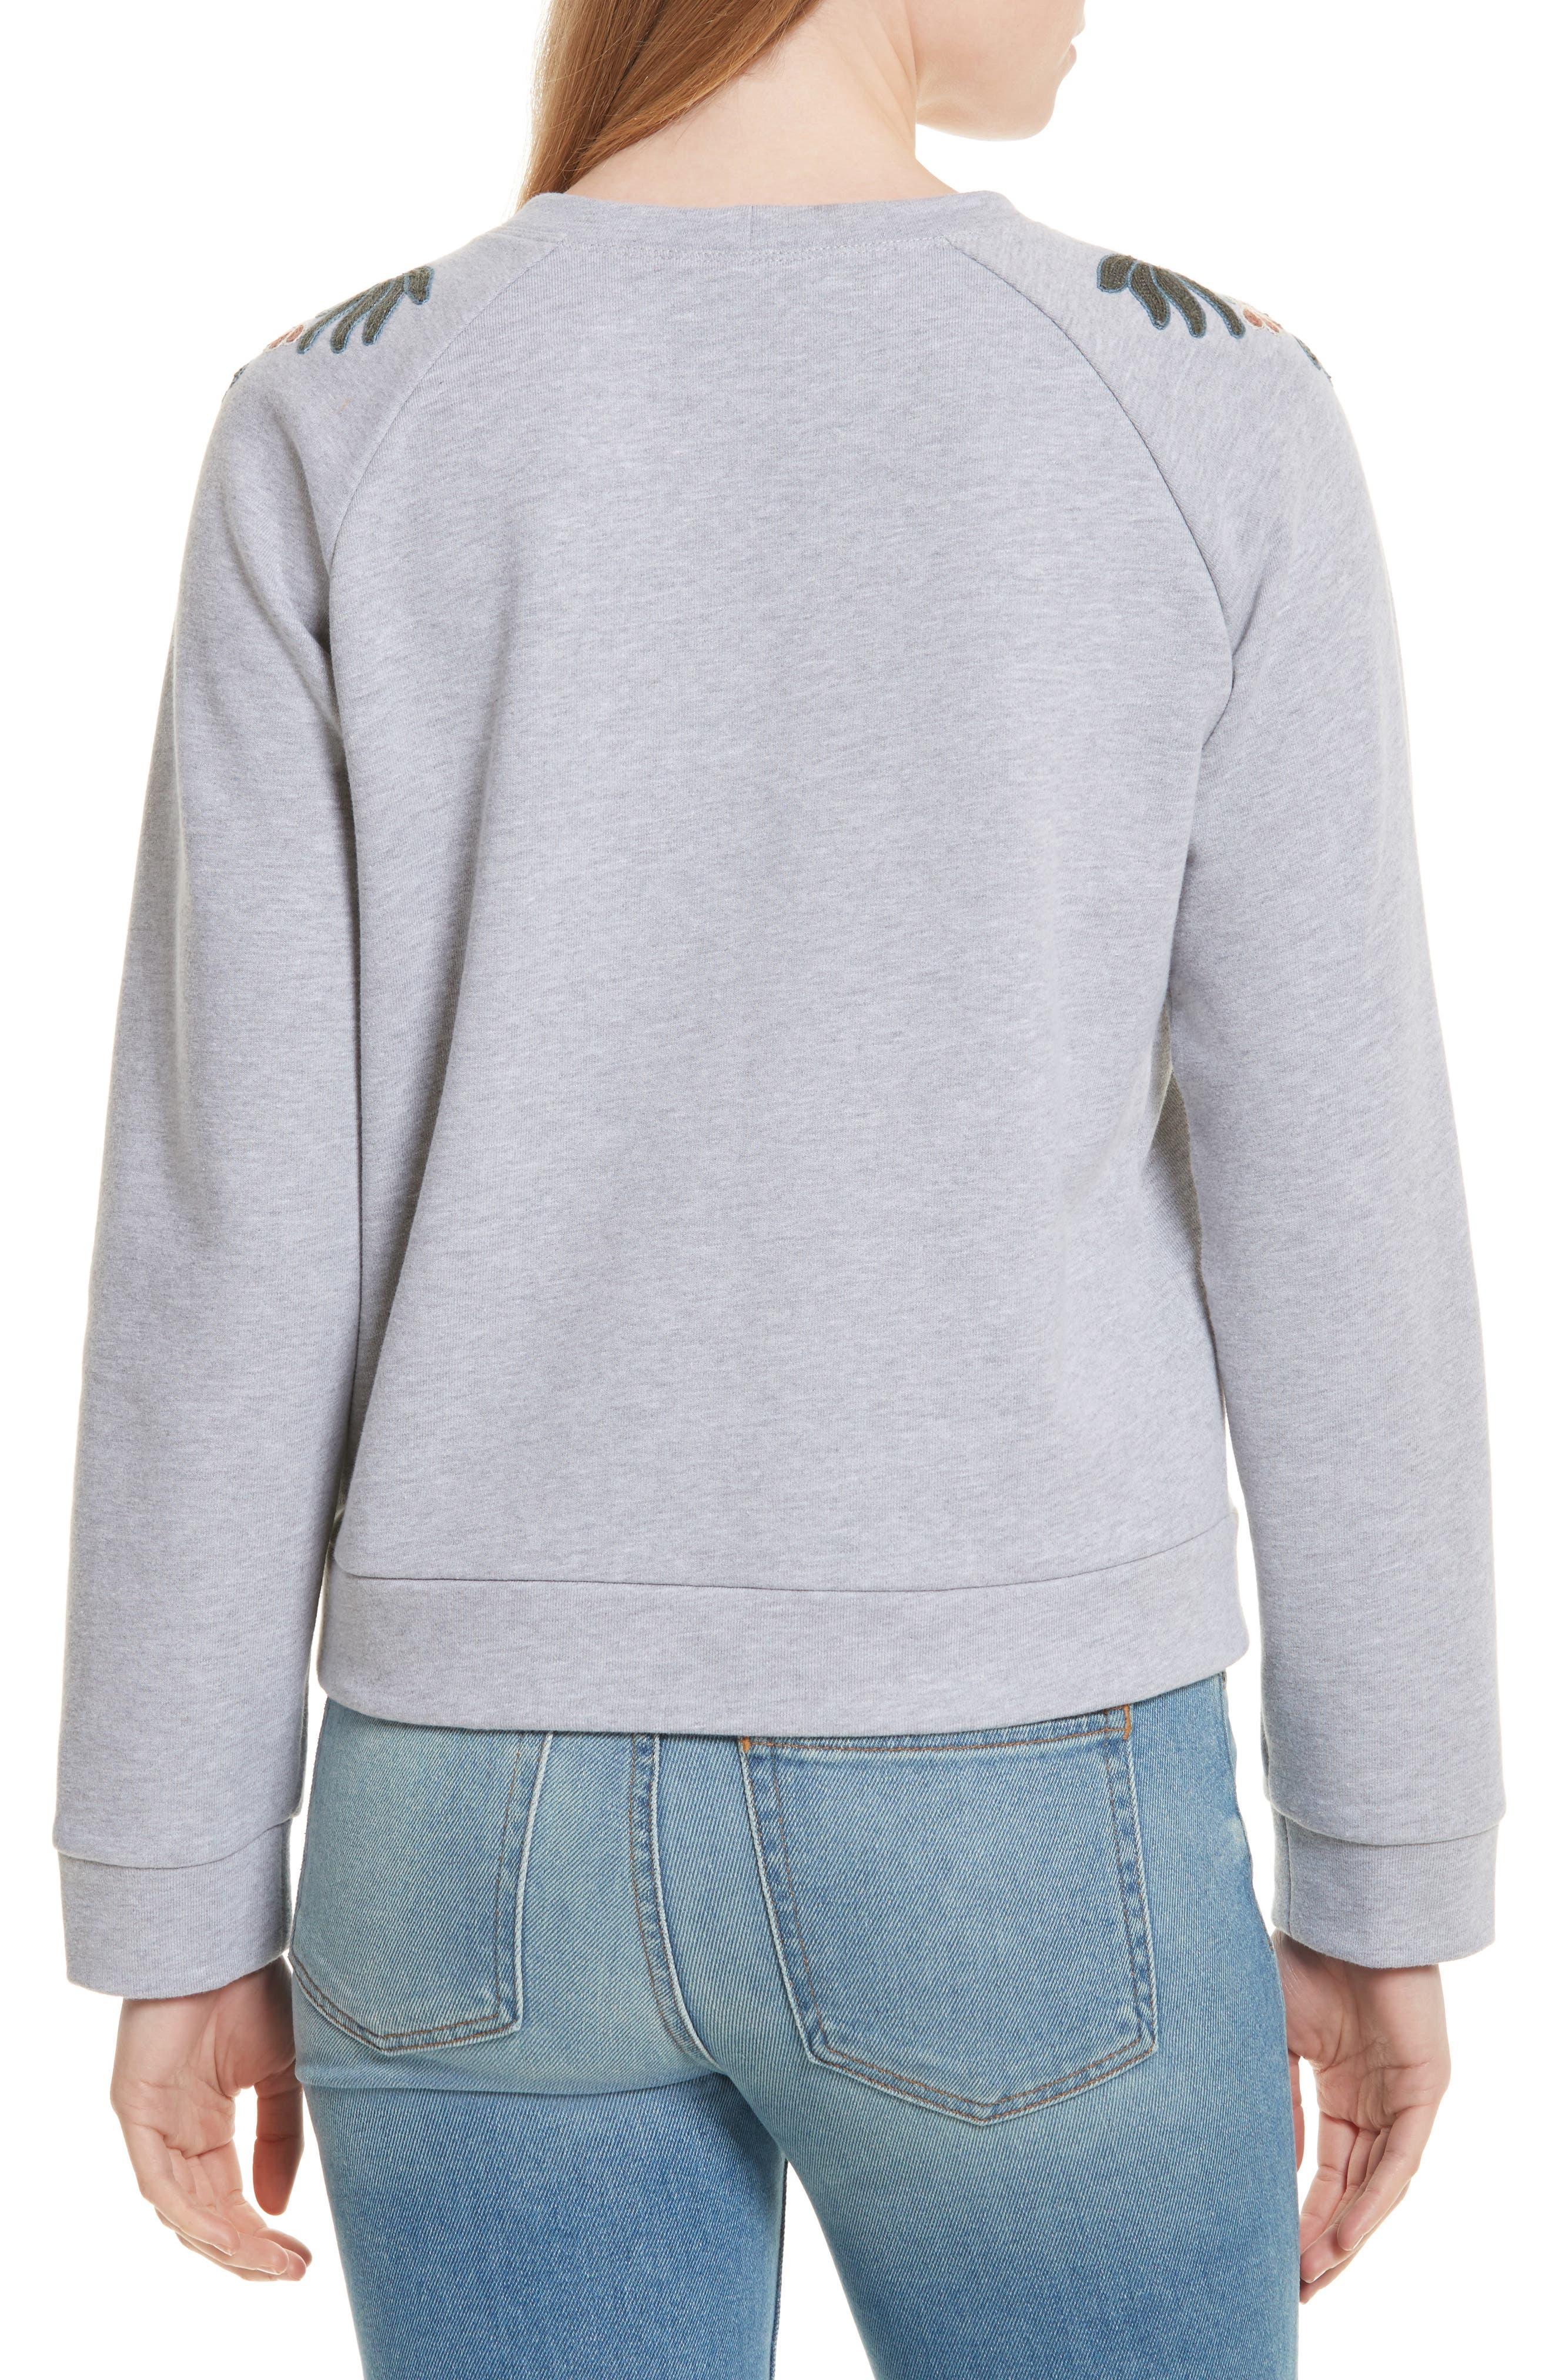 Jennings Embroidered Sweatshirt,                             Alternate thumbnail 2, color,                             021